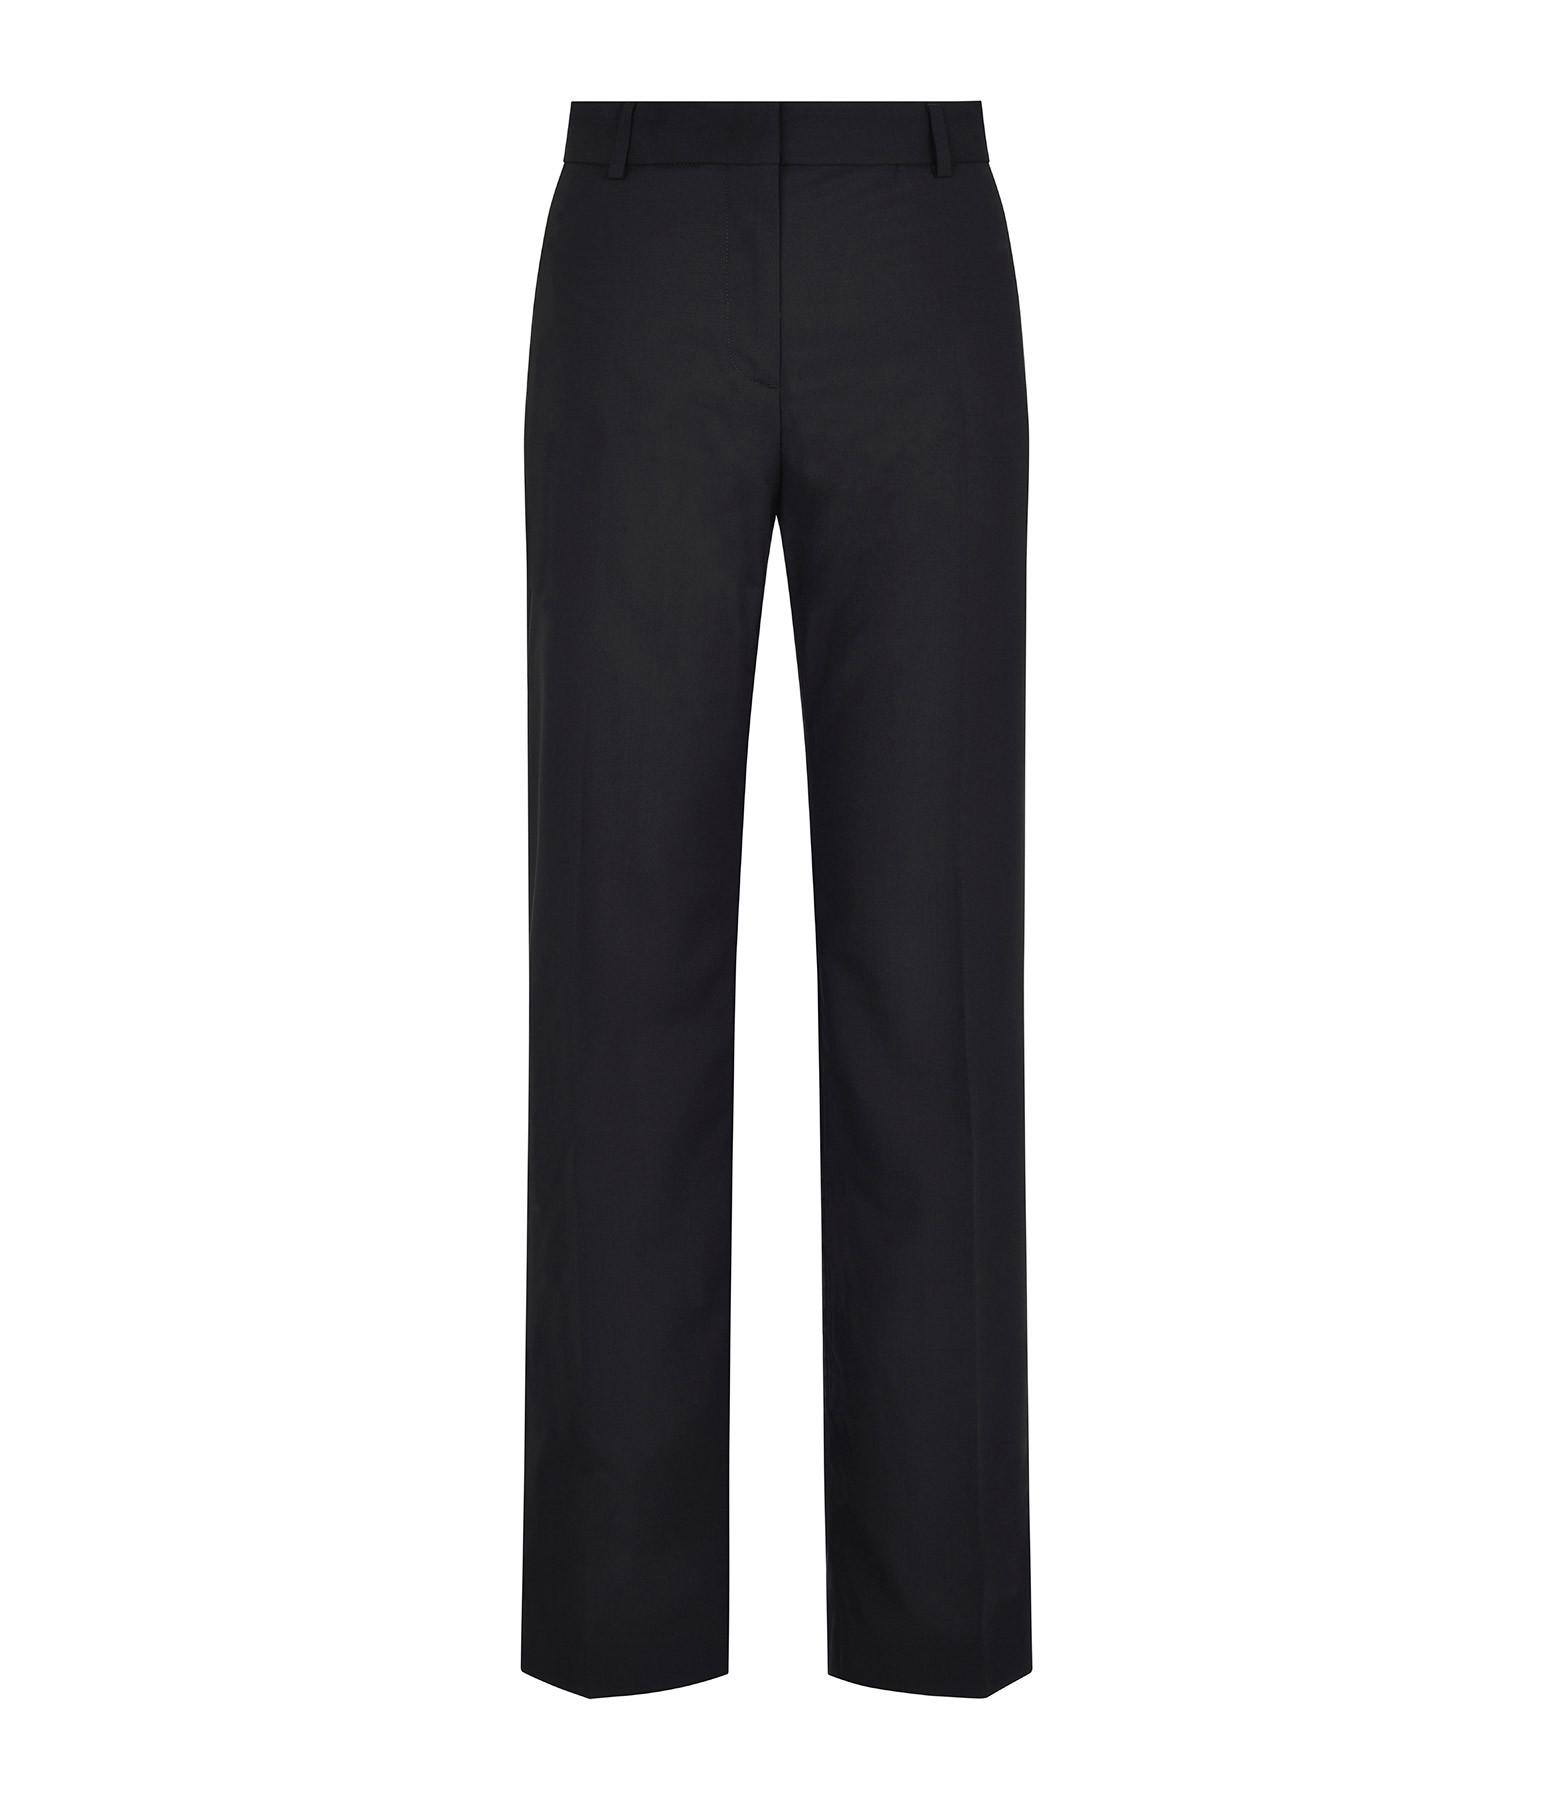 MSGM - Pantalon Noir